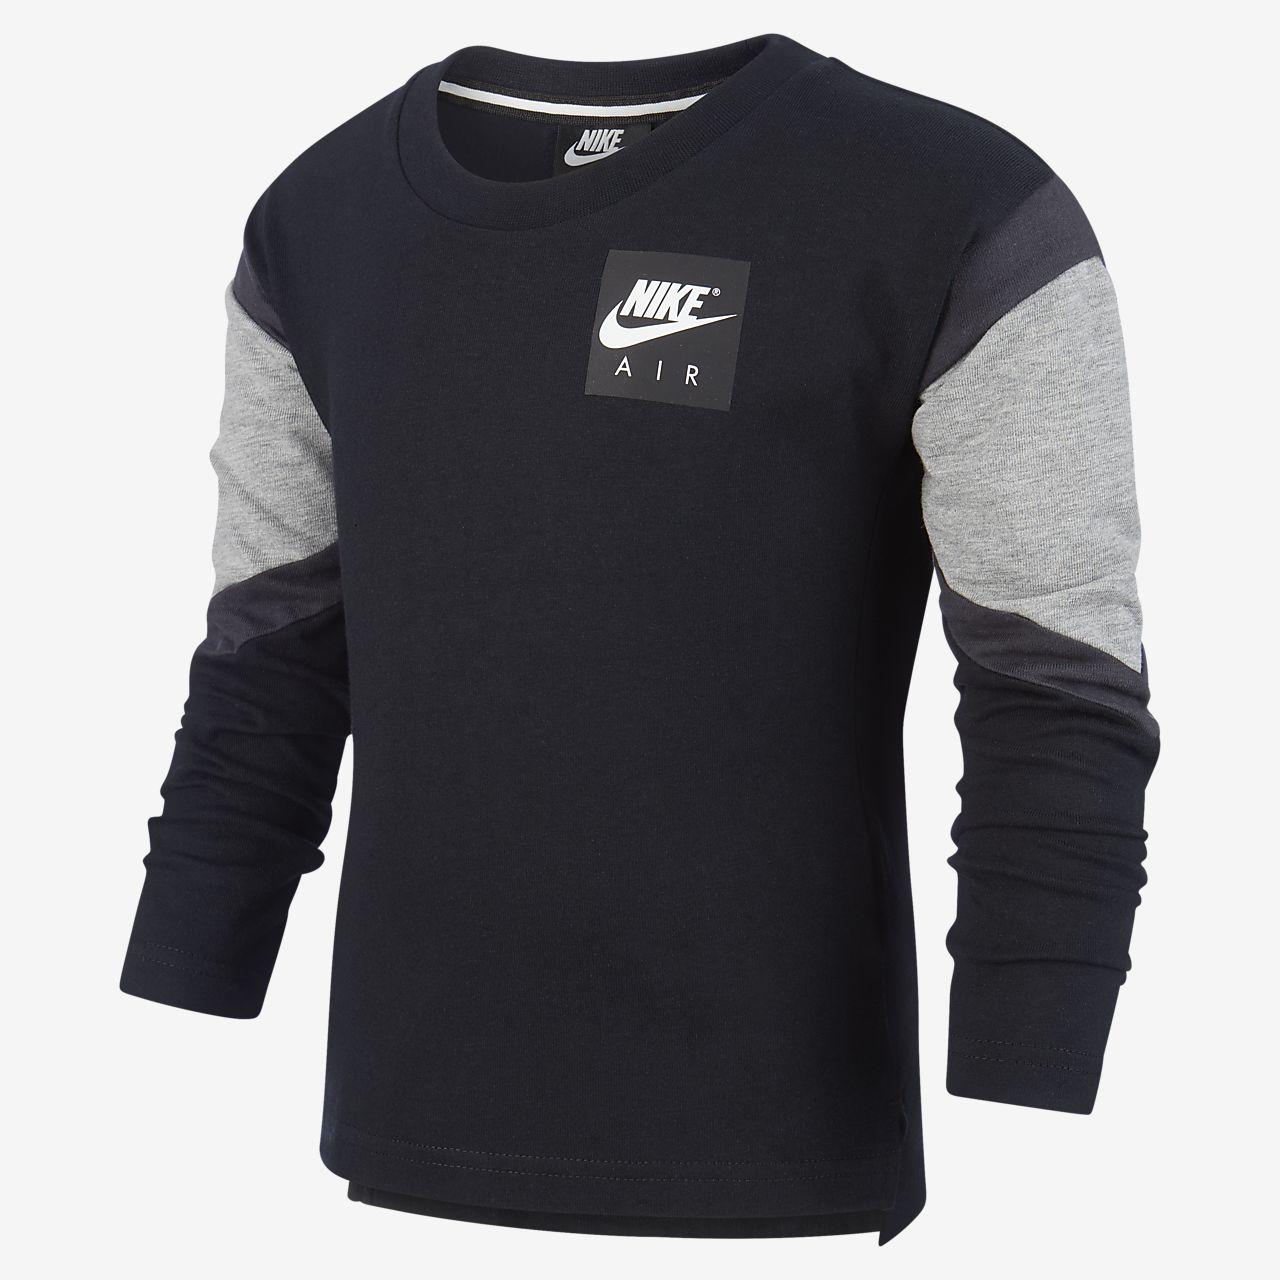 0672d784b9 Nike Air Toddler Camiseta de manga larga - Infantil. Nike.com ES